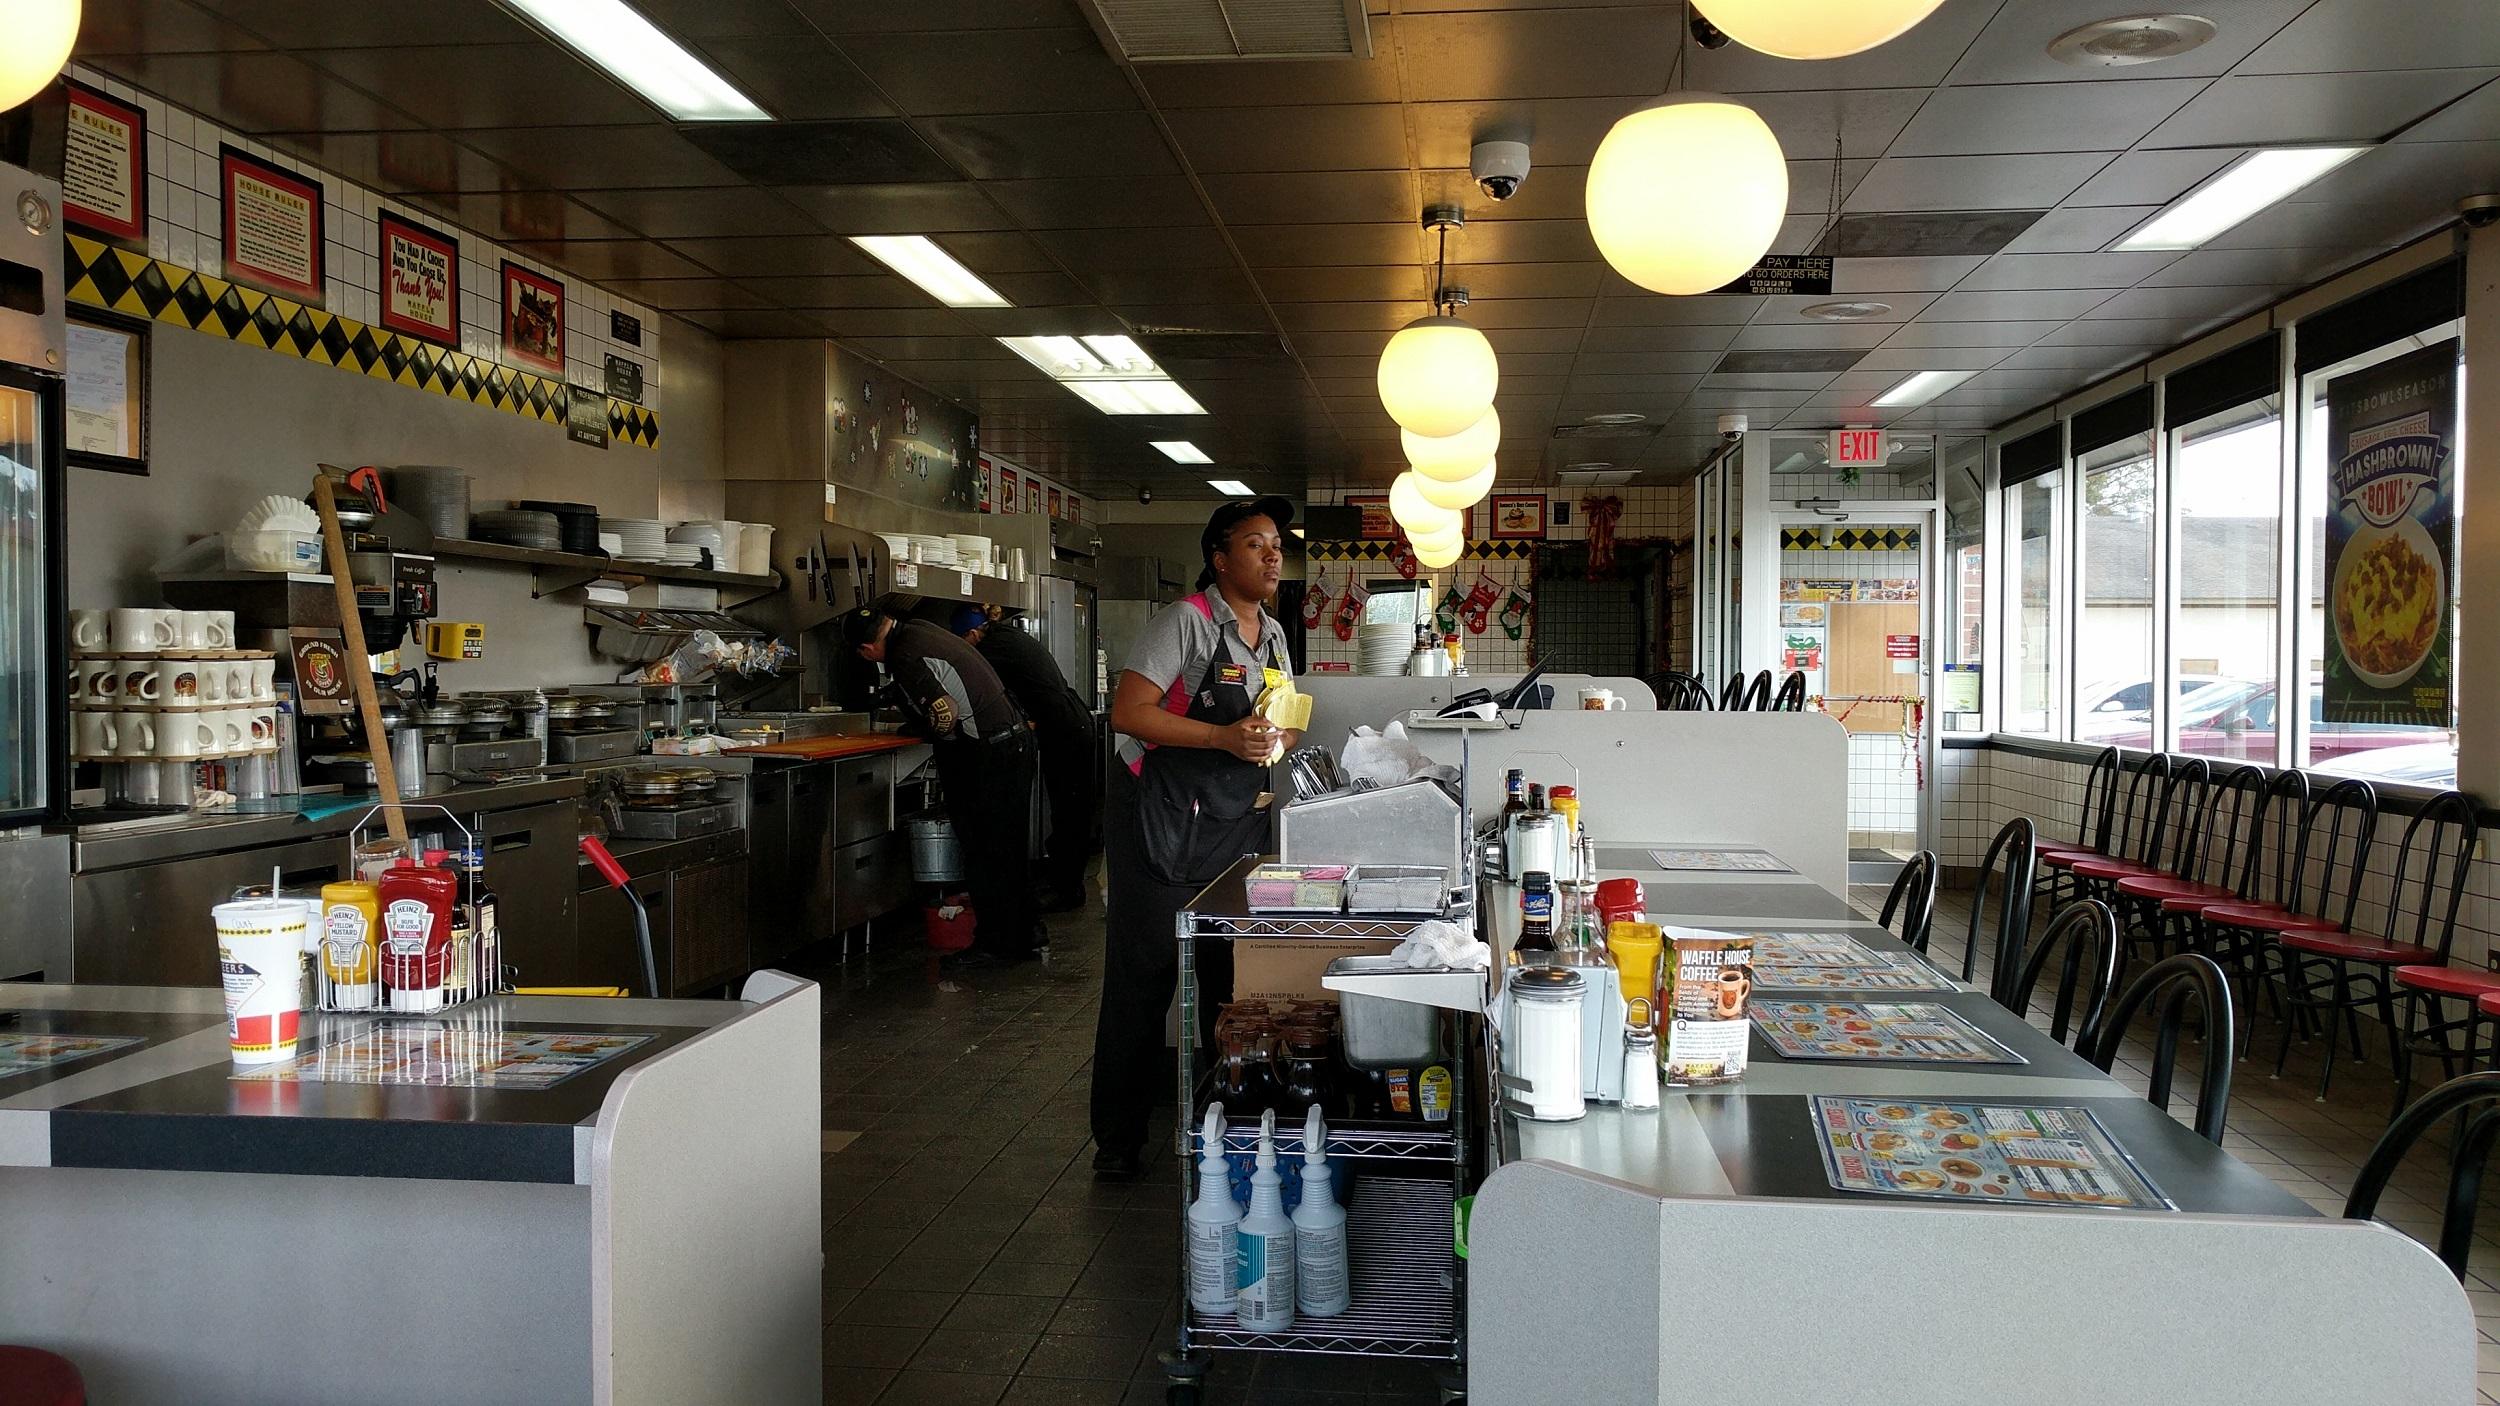 Kanye Waffle House Everything You Need To Know